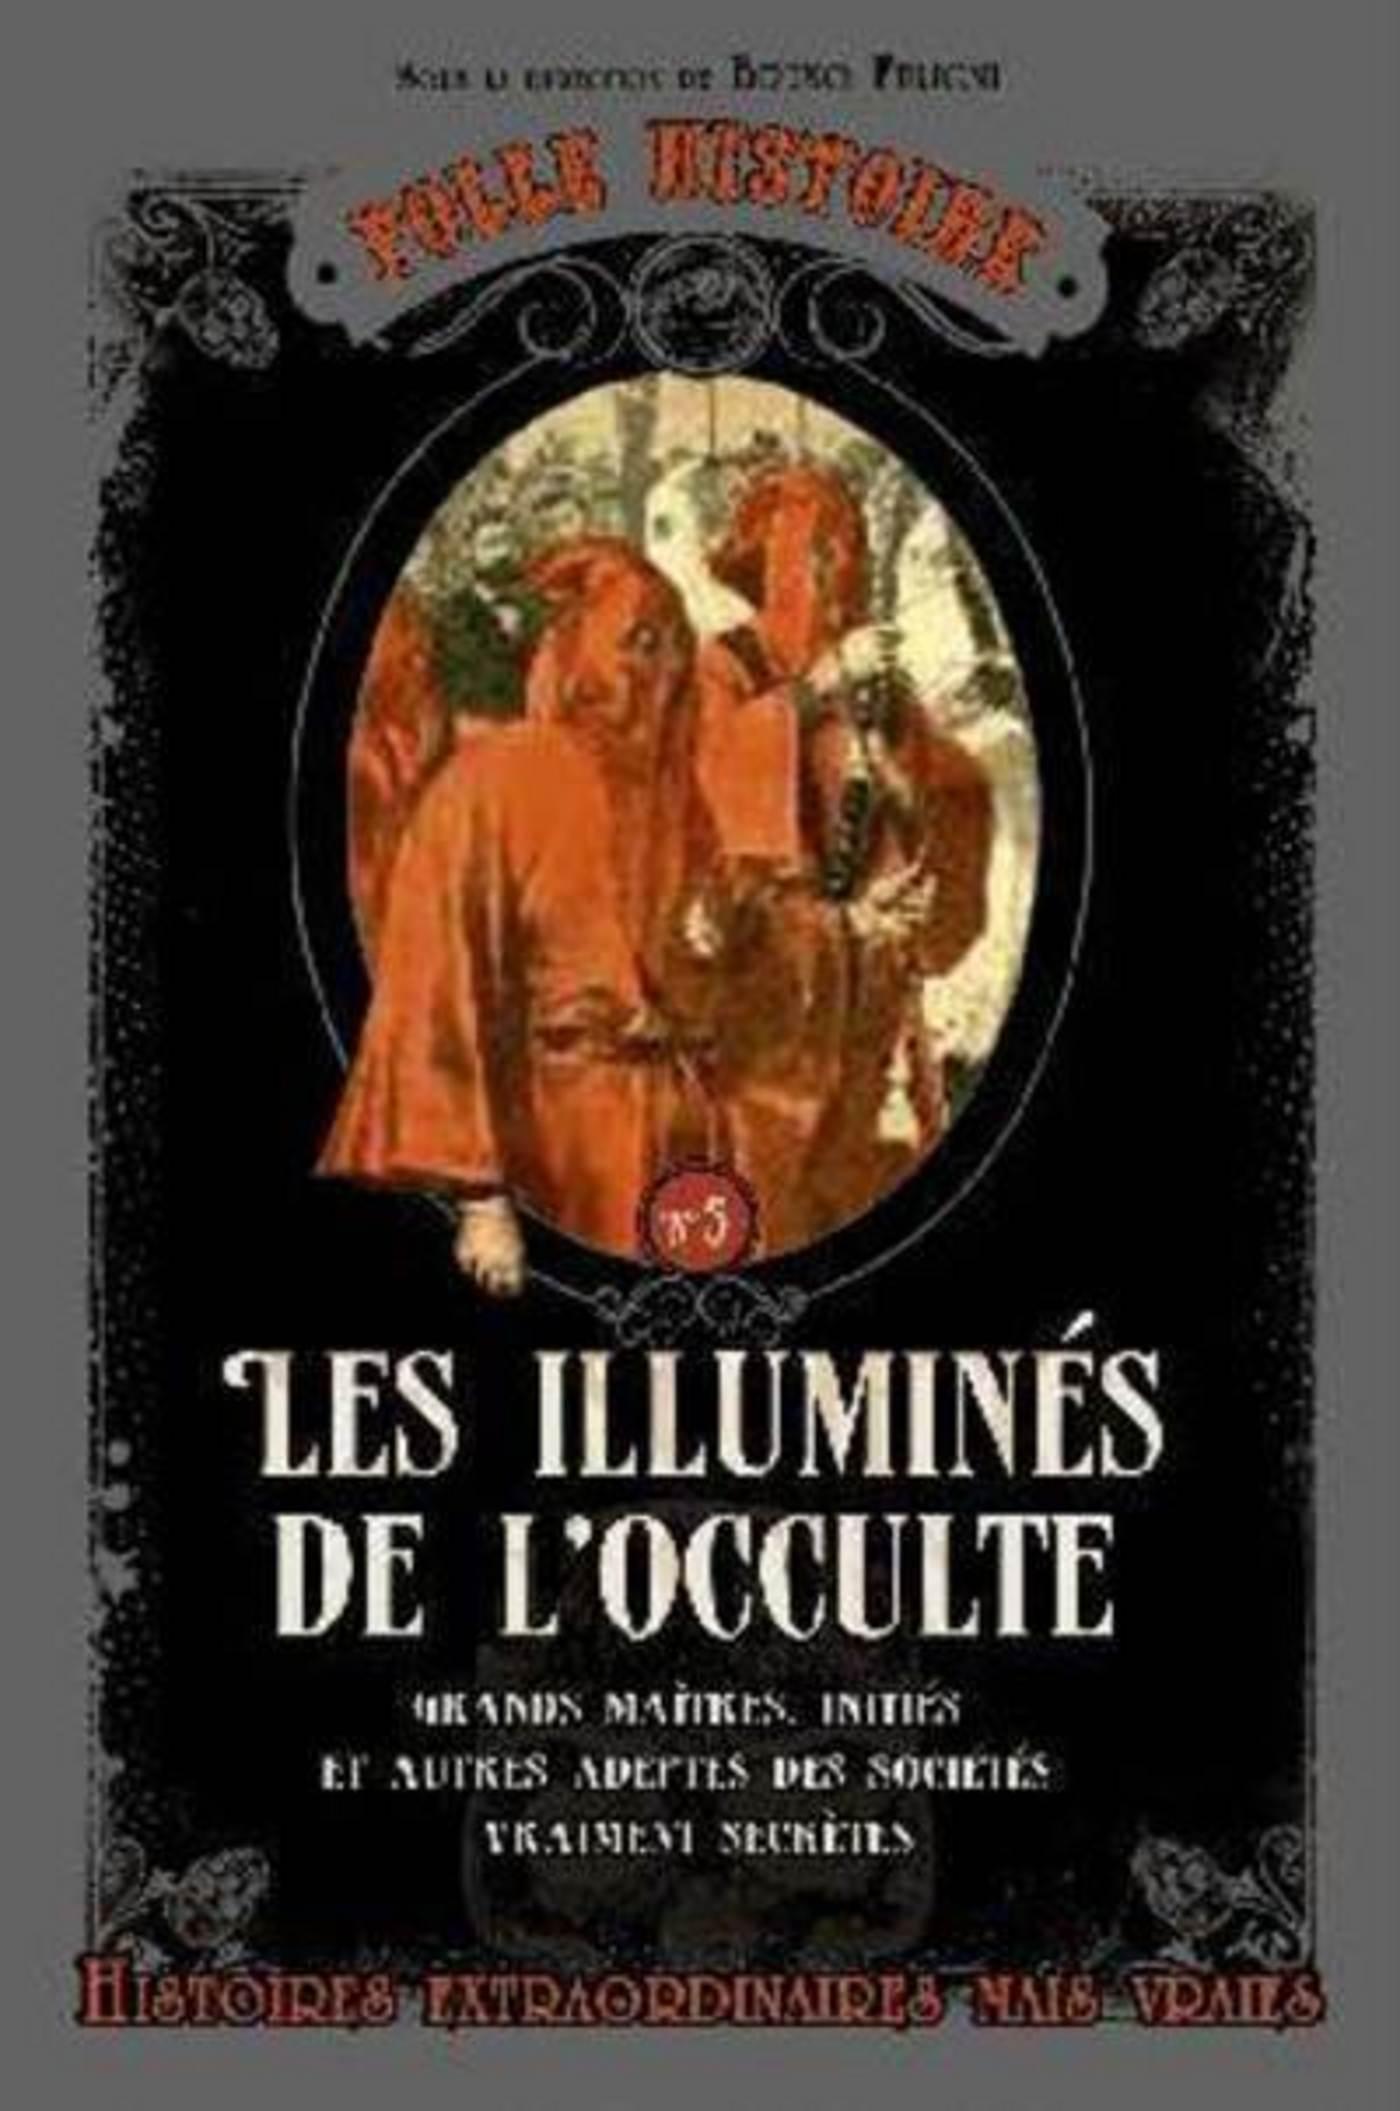 Folle histoire - Les illuminés de l'occulte (ebook)